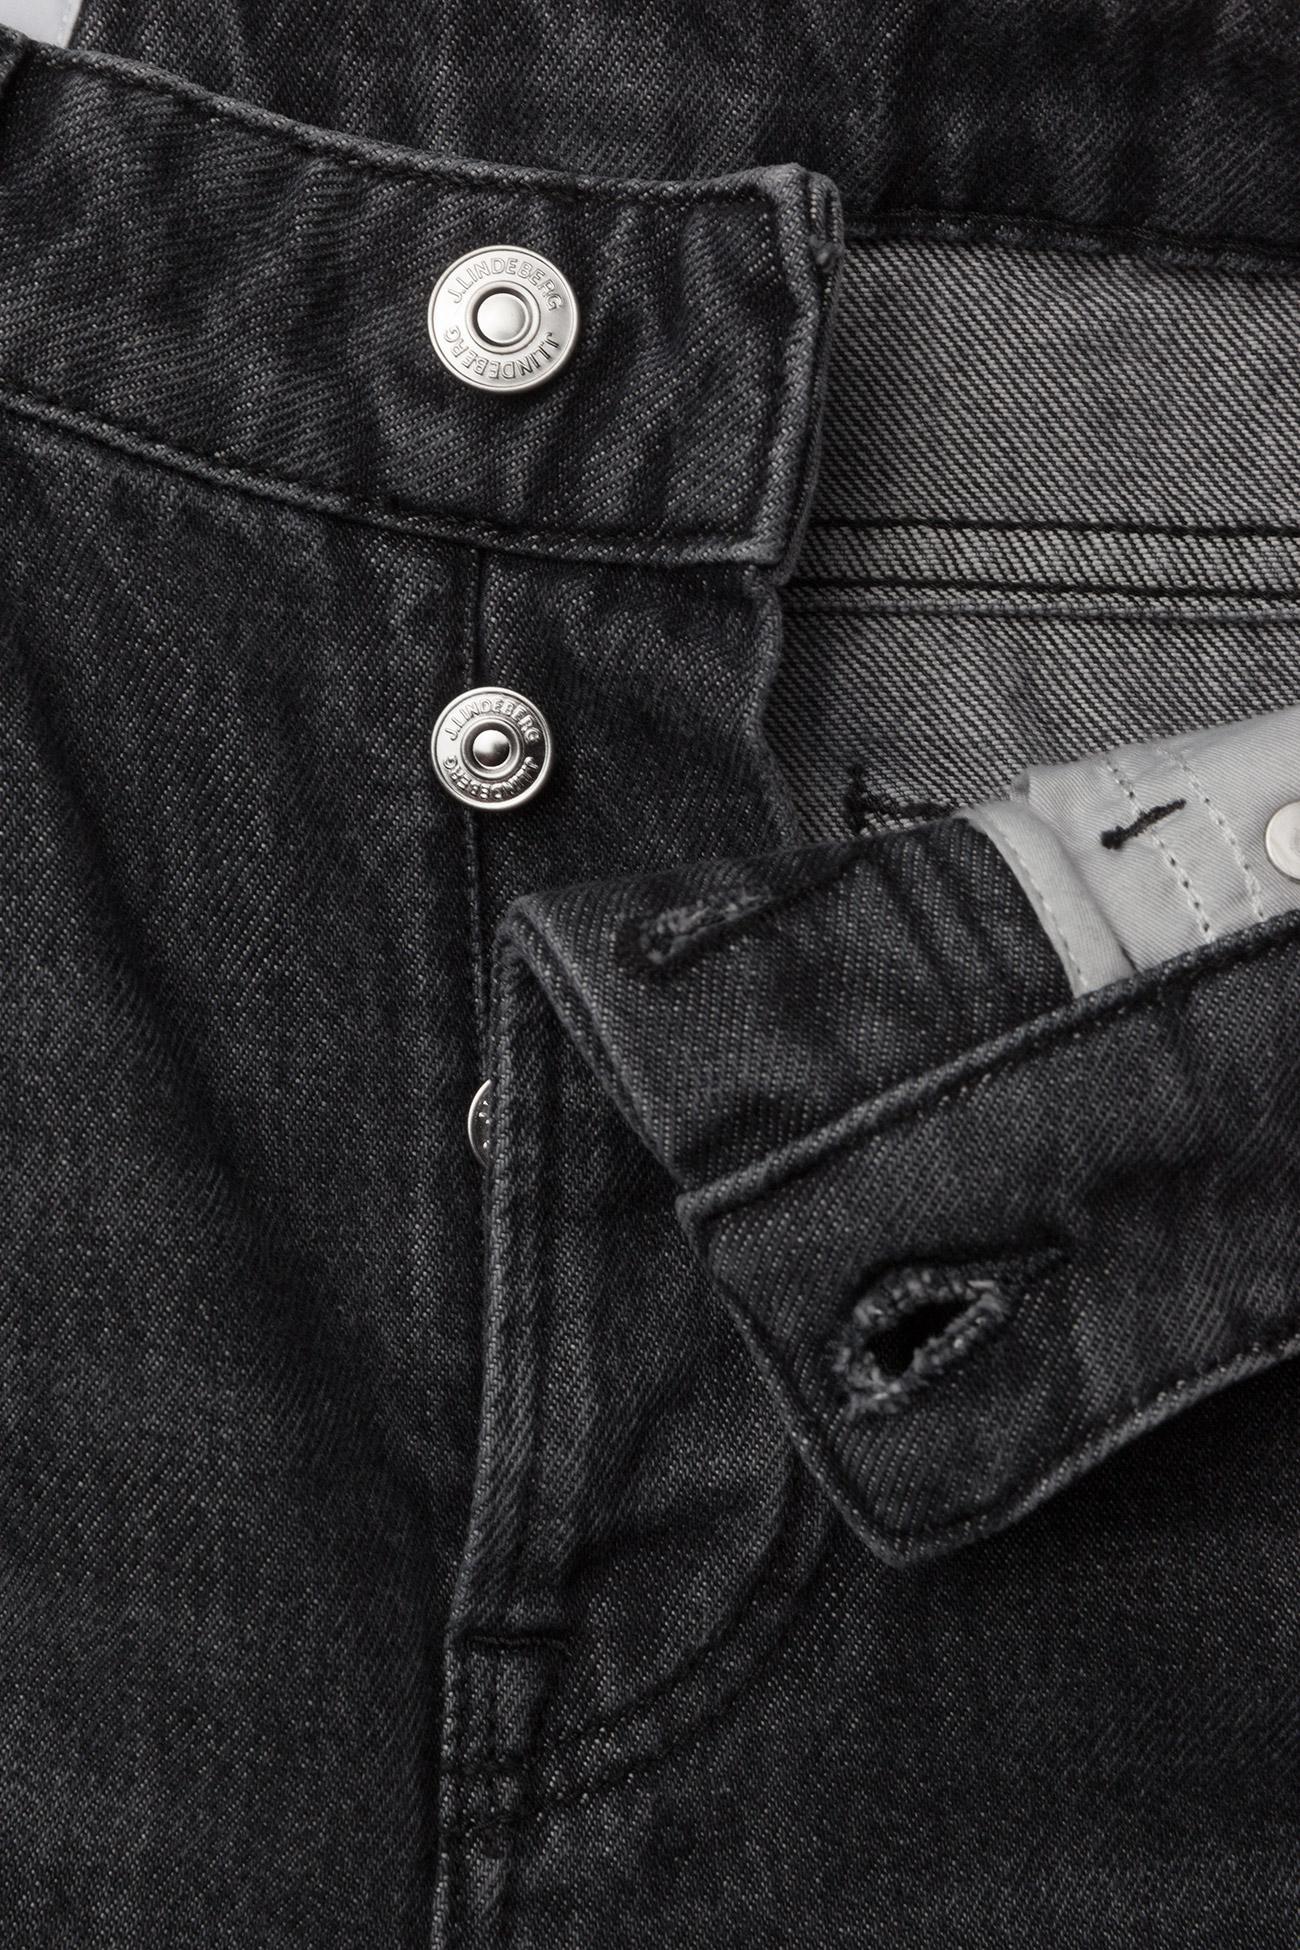 J. Lindeberg Study Black Stone - Jeans DK GREY